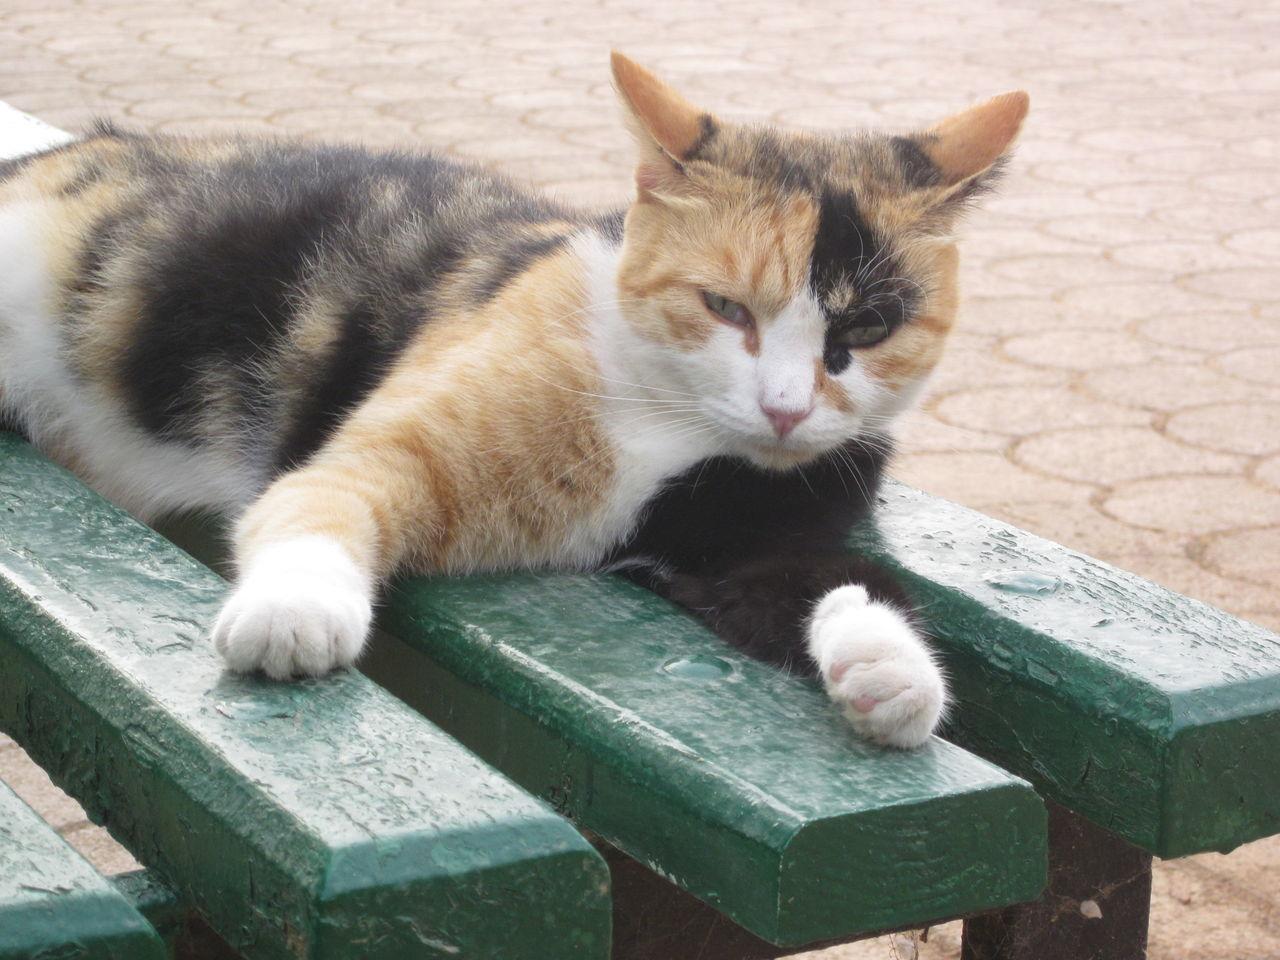 Malta Bank Cat Katze Mixed Color Cat No People One Animal Outdoors Pfoten